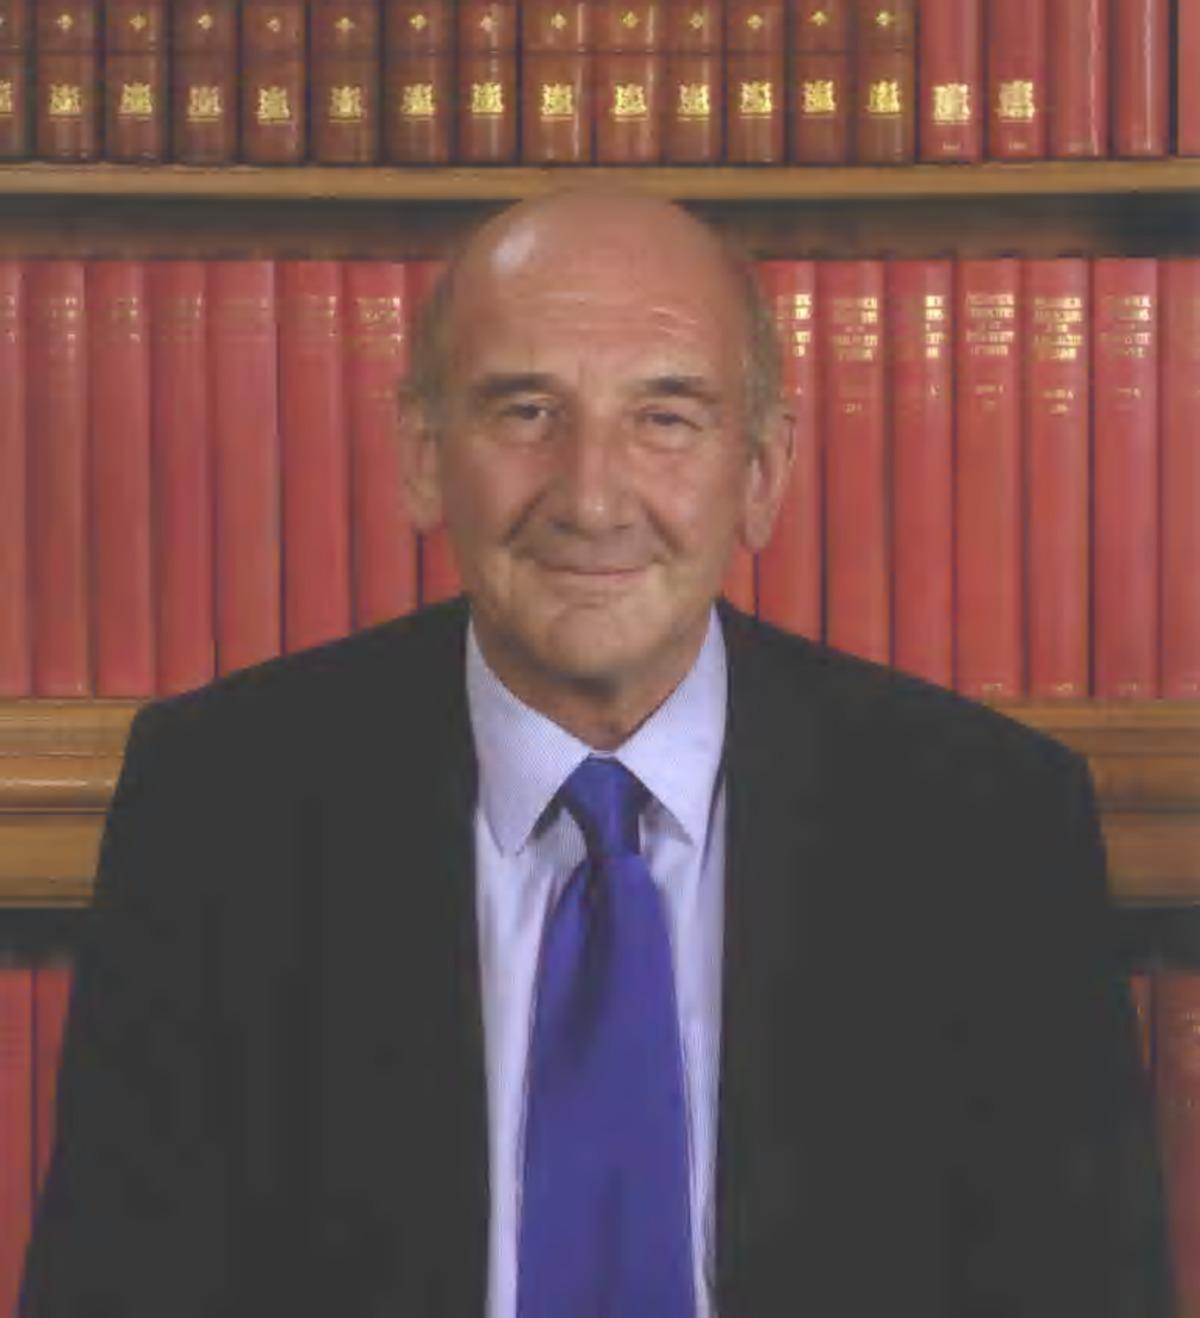 peter j barnes (respiratory scientist) wikipedia